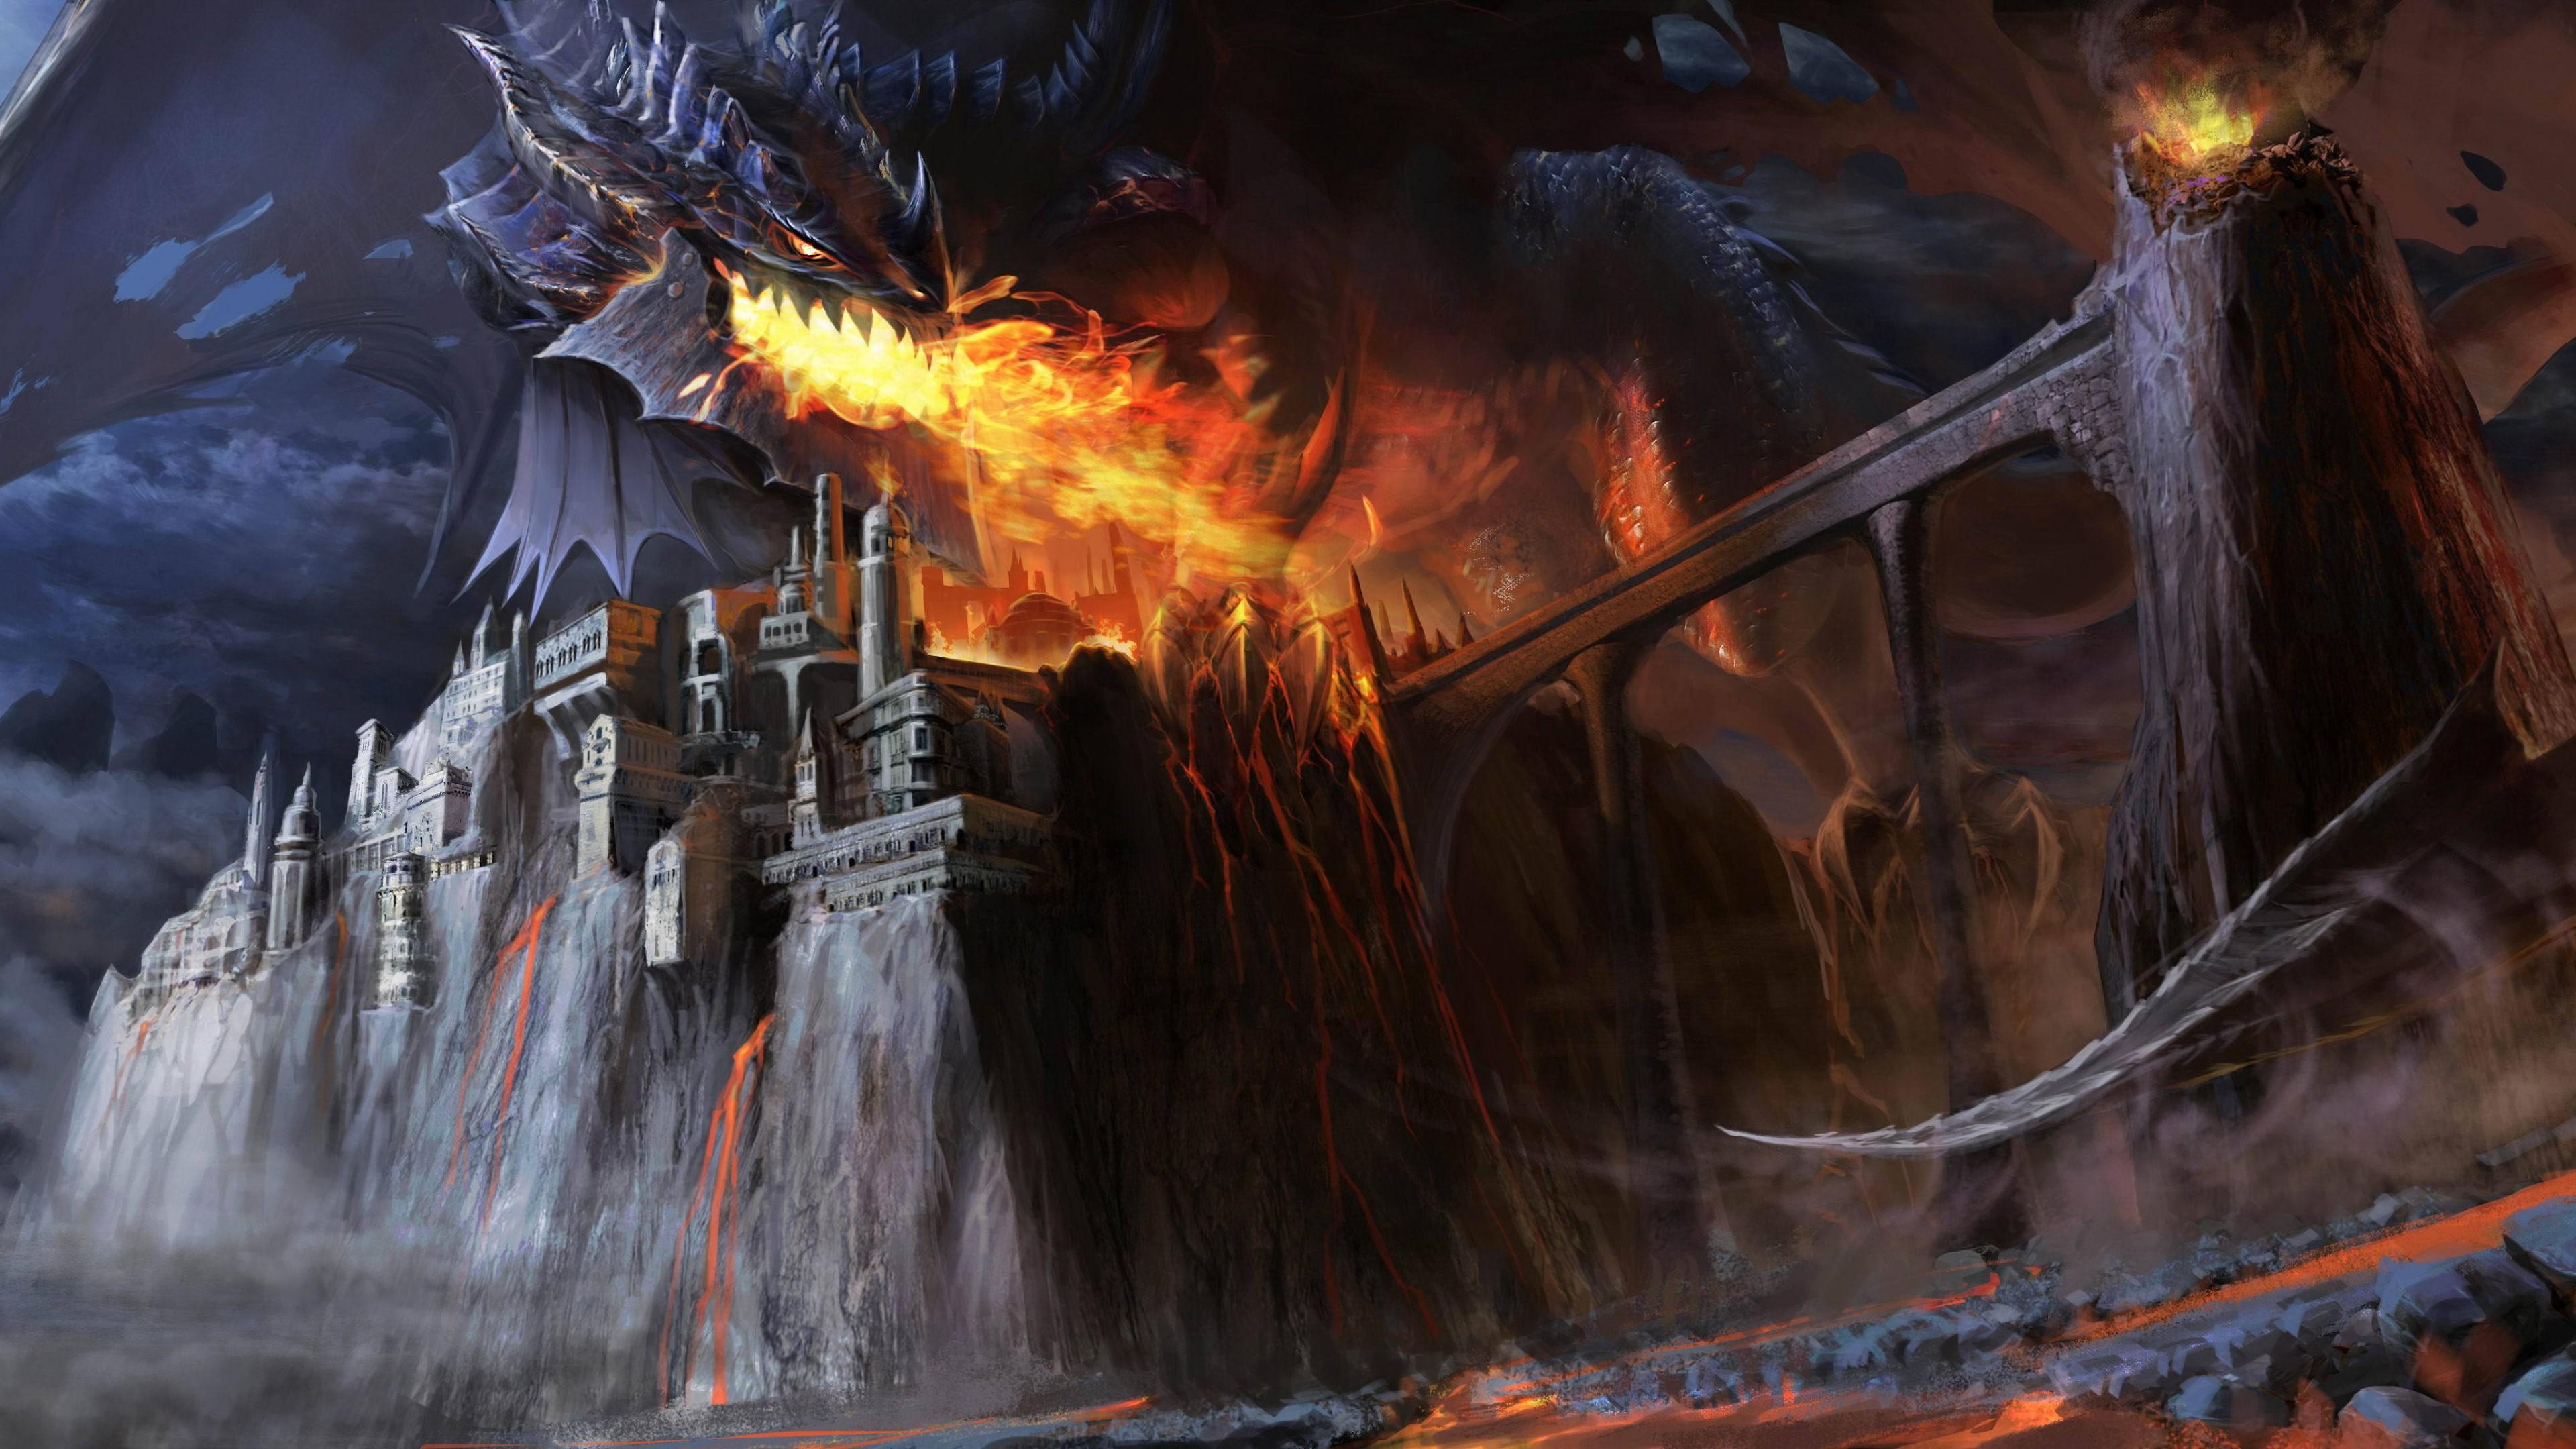 Iphone Wallpaper Cloud Wallpaper Dragon Black Fire Castle Bridge Lava Smoke